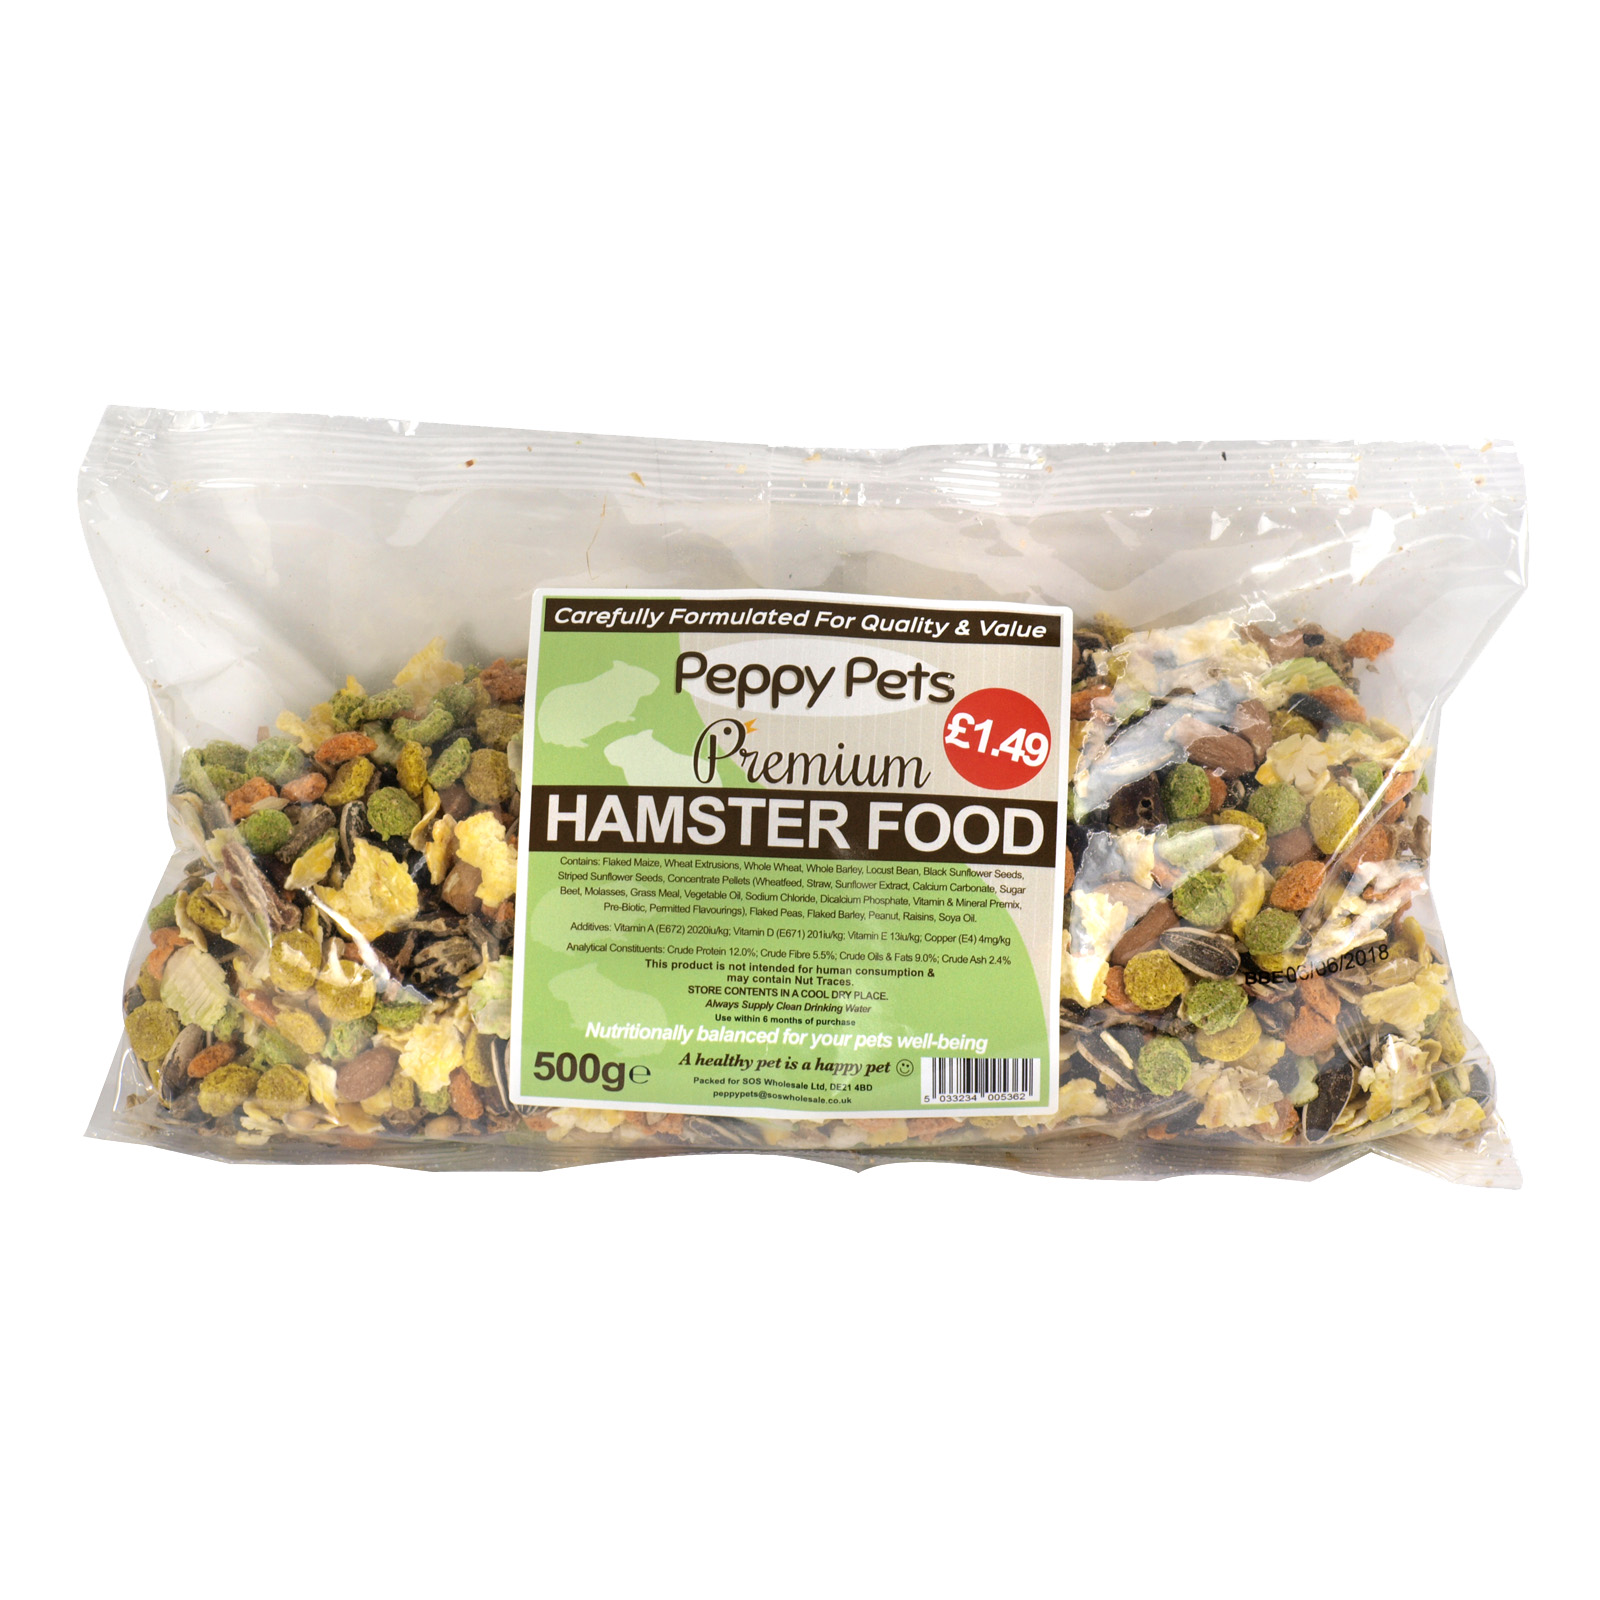 PEPPY PETS HAMSTER FOOD PM?1.49 500GM